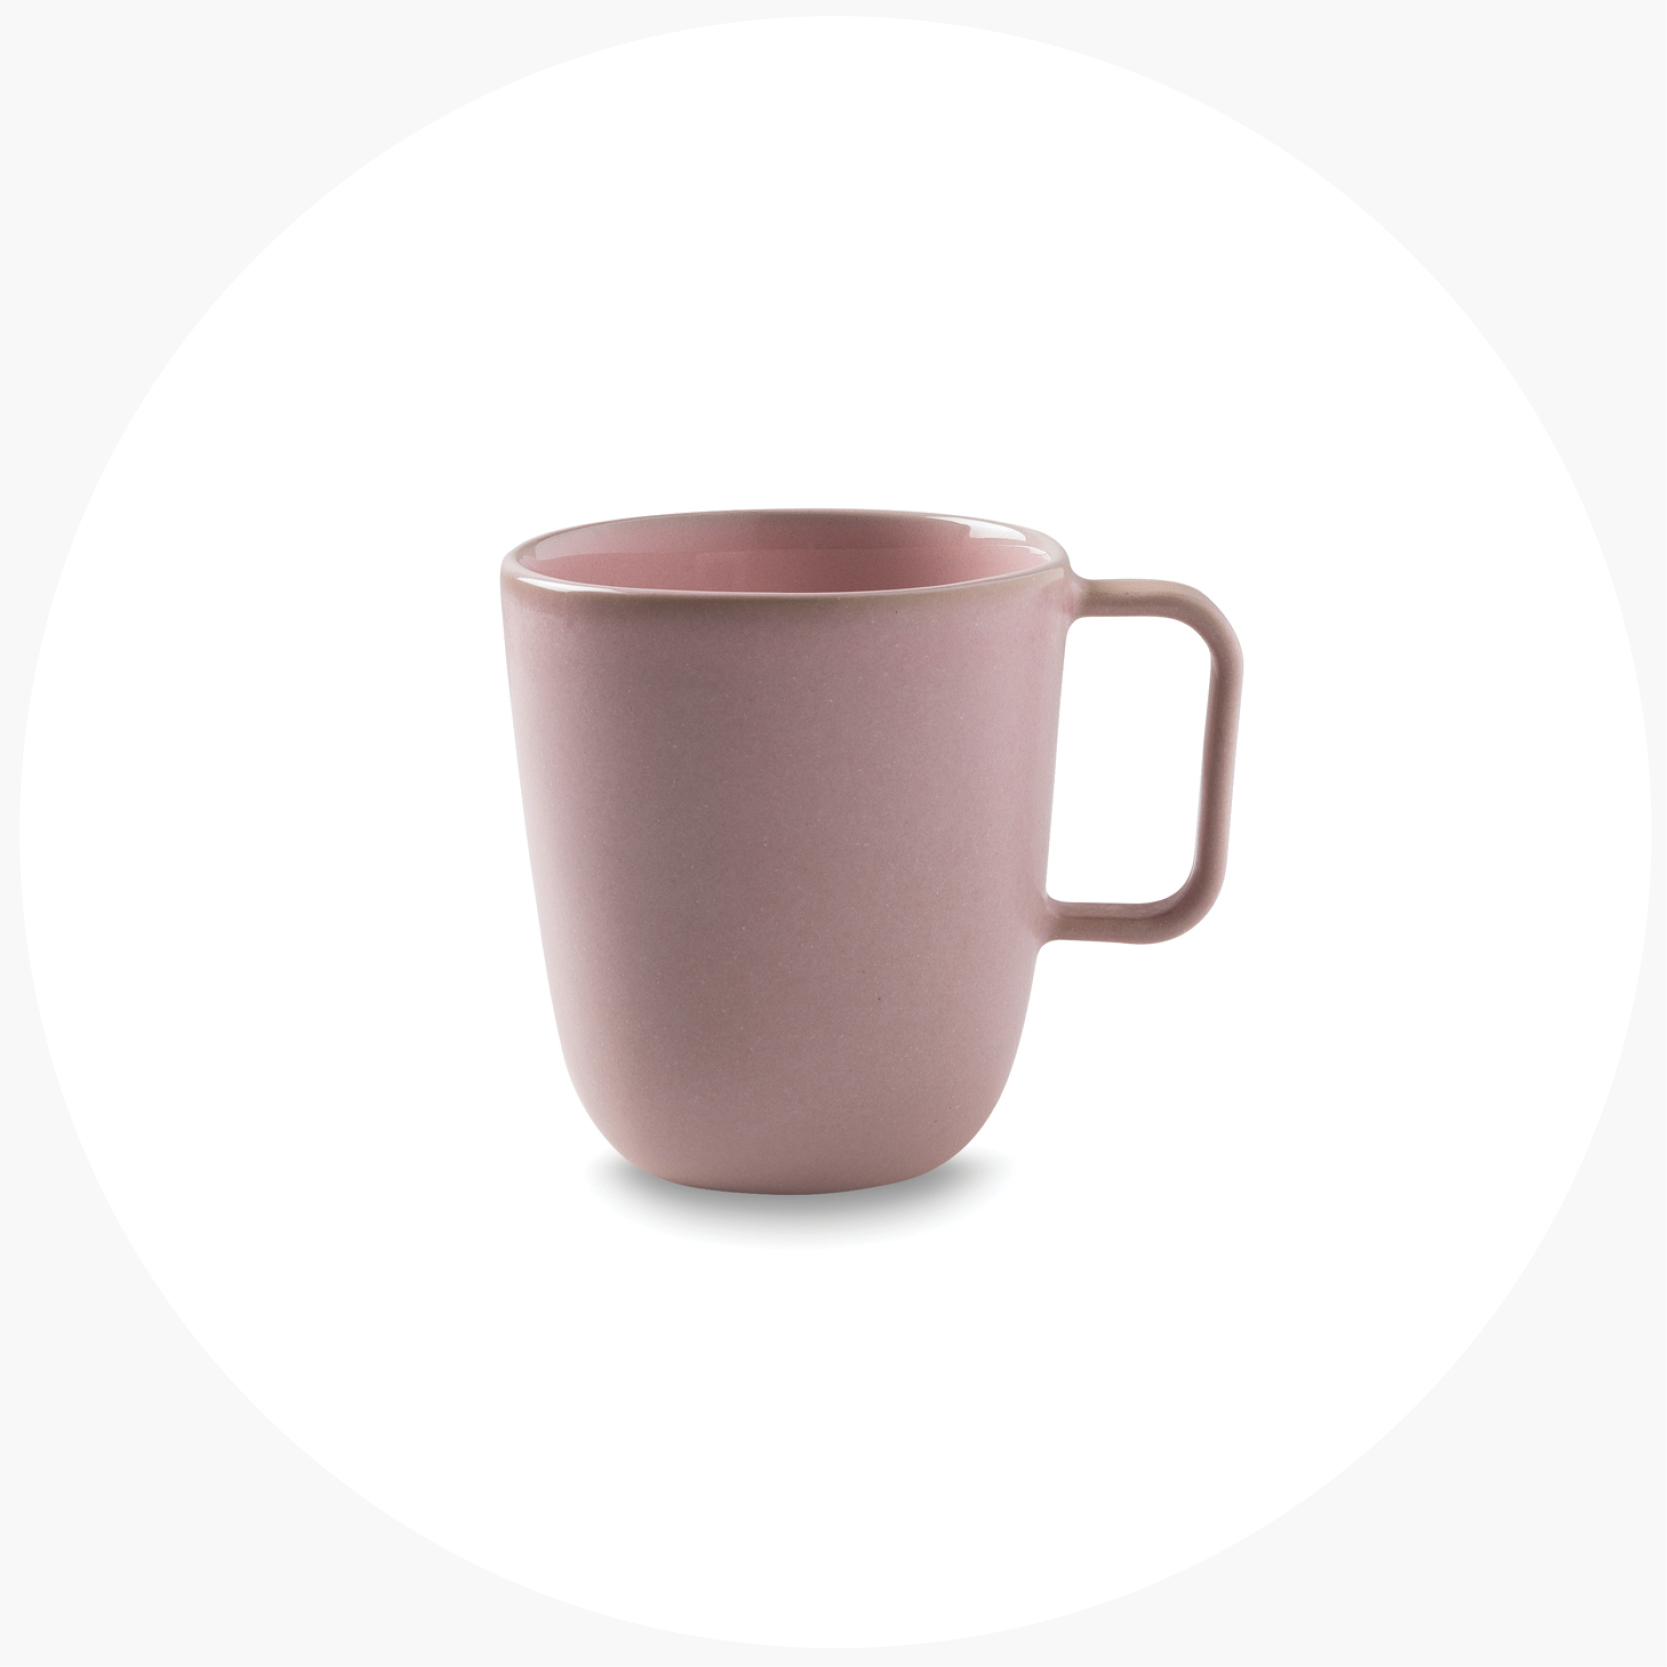 6  vessel for water  .  talo mug $25.90